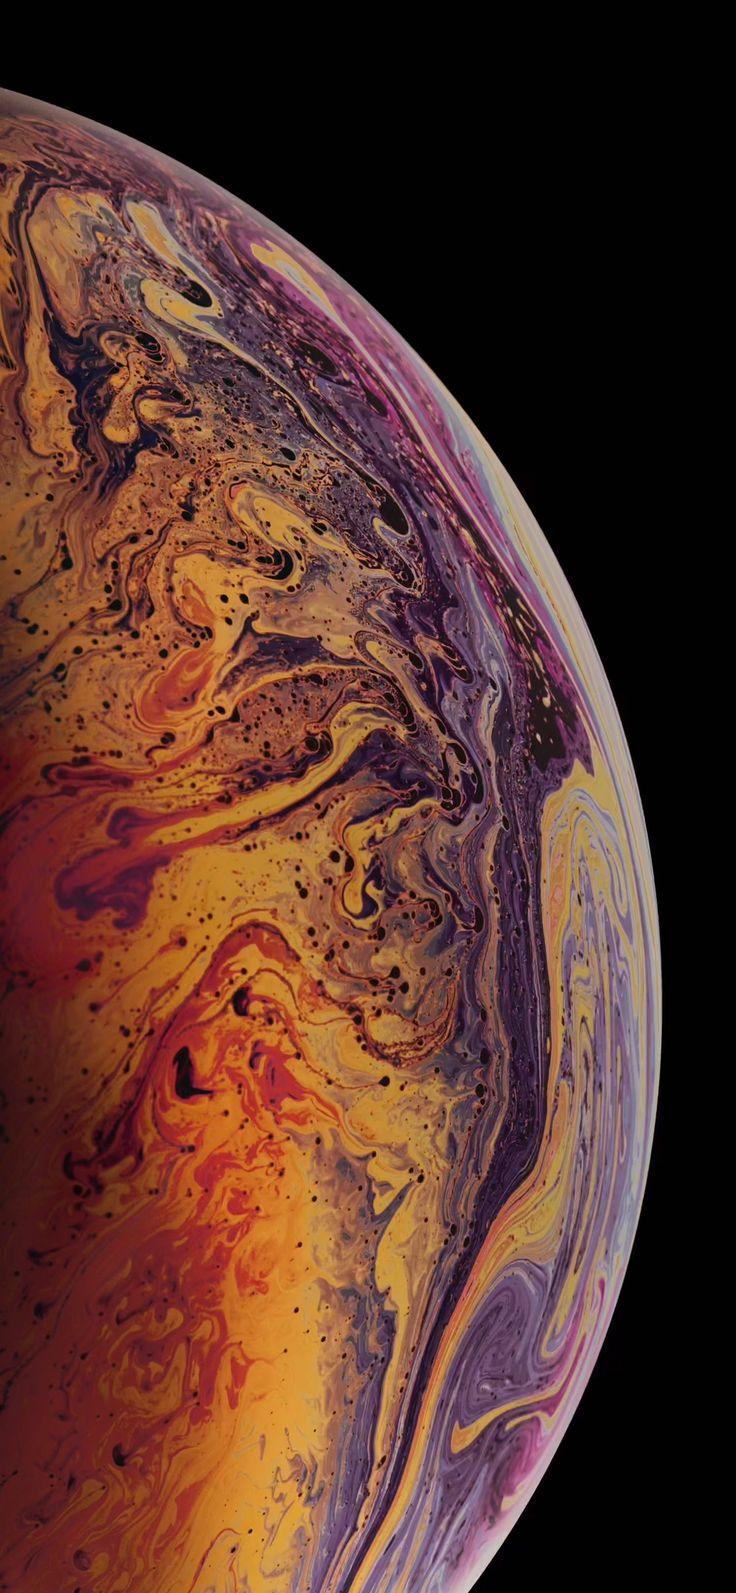 Download Iphone Xs Max Earth Wallpaper 4k | Apple ...